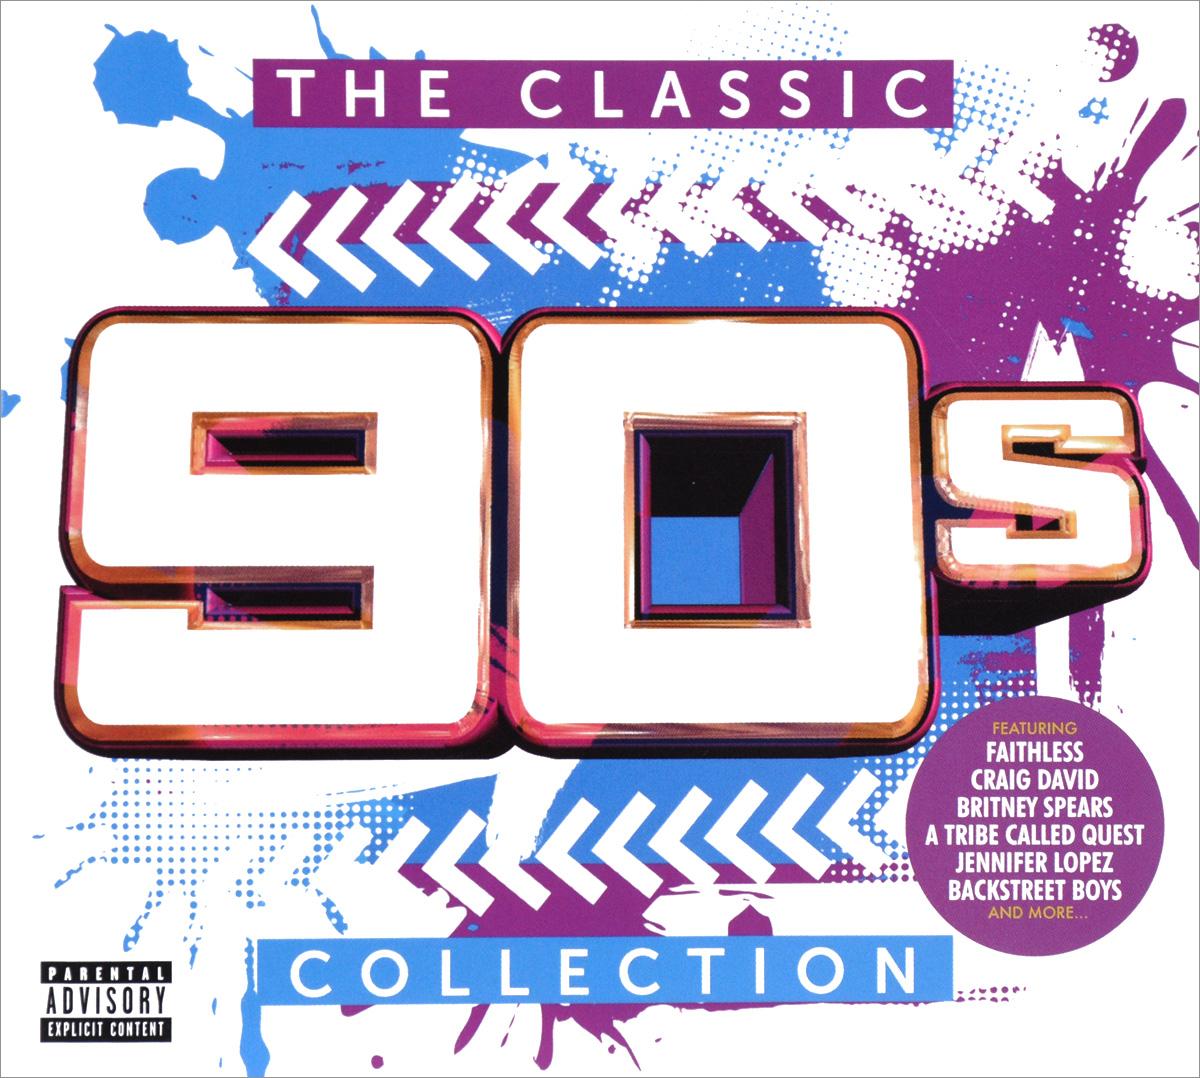 Backstreet Boys,Селин Дион,Дженнифер Лопес,Крейг Дэвид,Run-DMC,Дайана Кинг,TLC,Spin Doctors,Crazy Town,Джеф Бакли The Classic 90s Collection (3 CD)